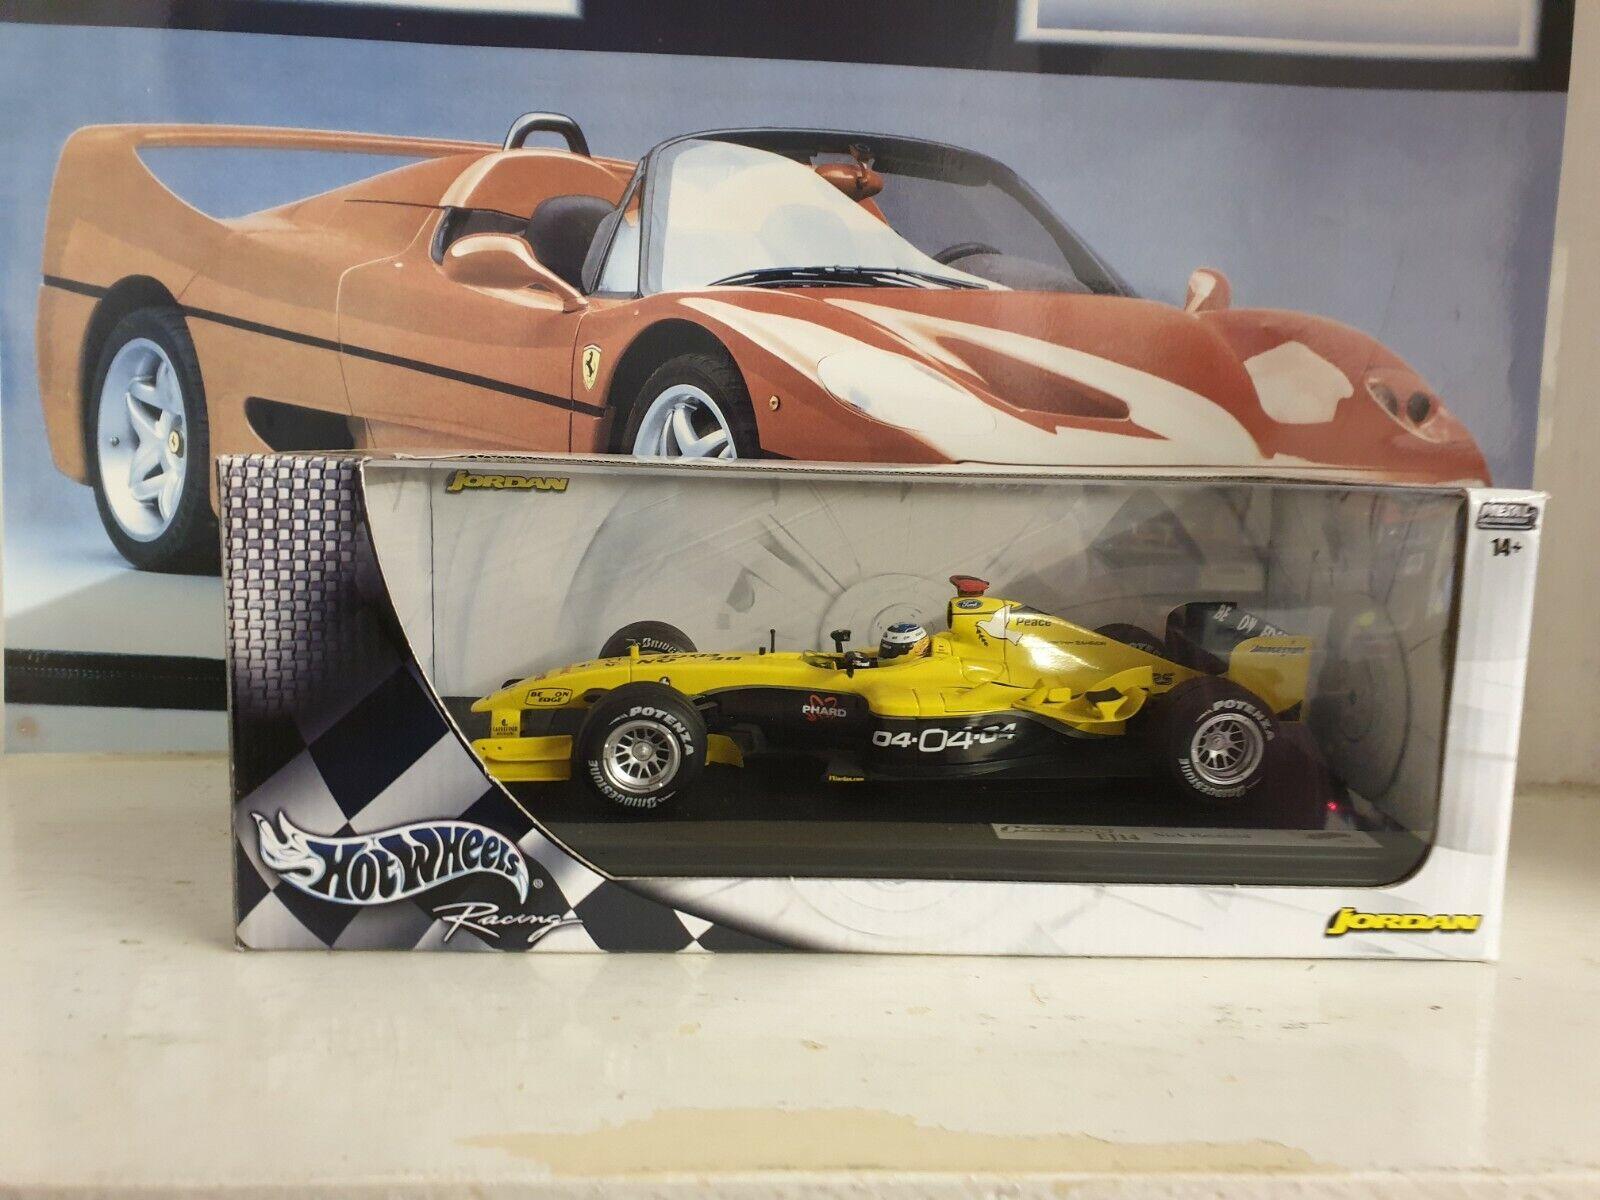 HOTWHEELS   F1  - JORDAN EJ14 - N HEIDFELD  - 1 18 SCALE MODEL CAR - B6203